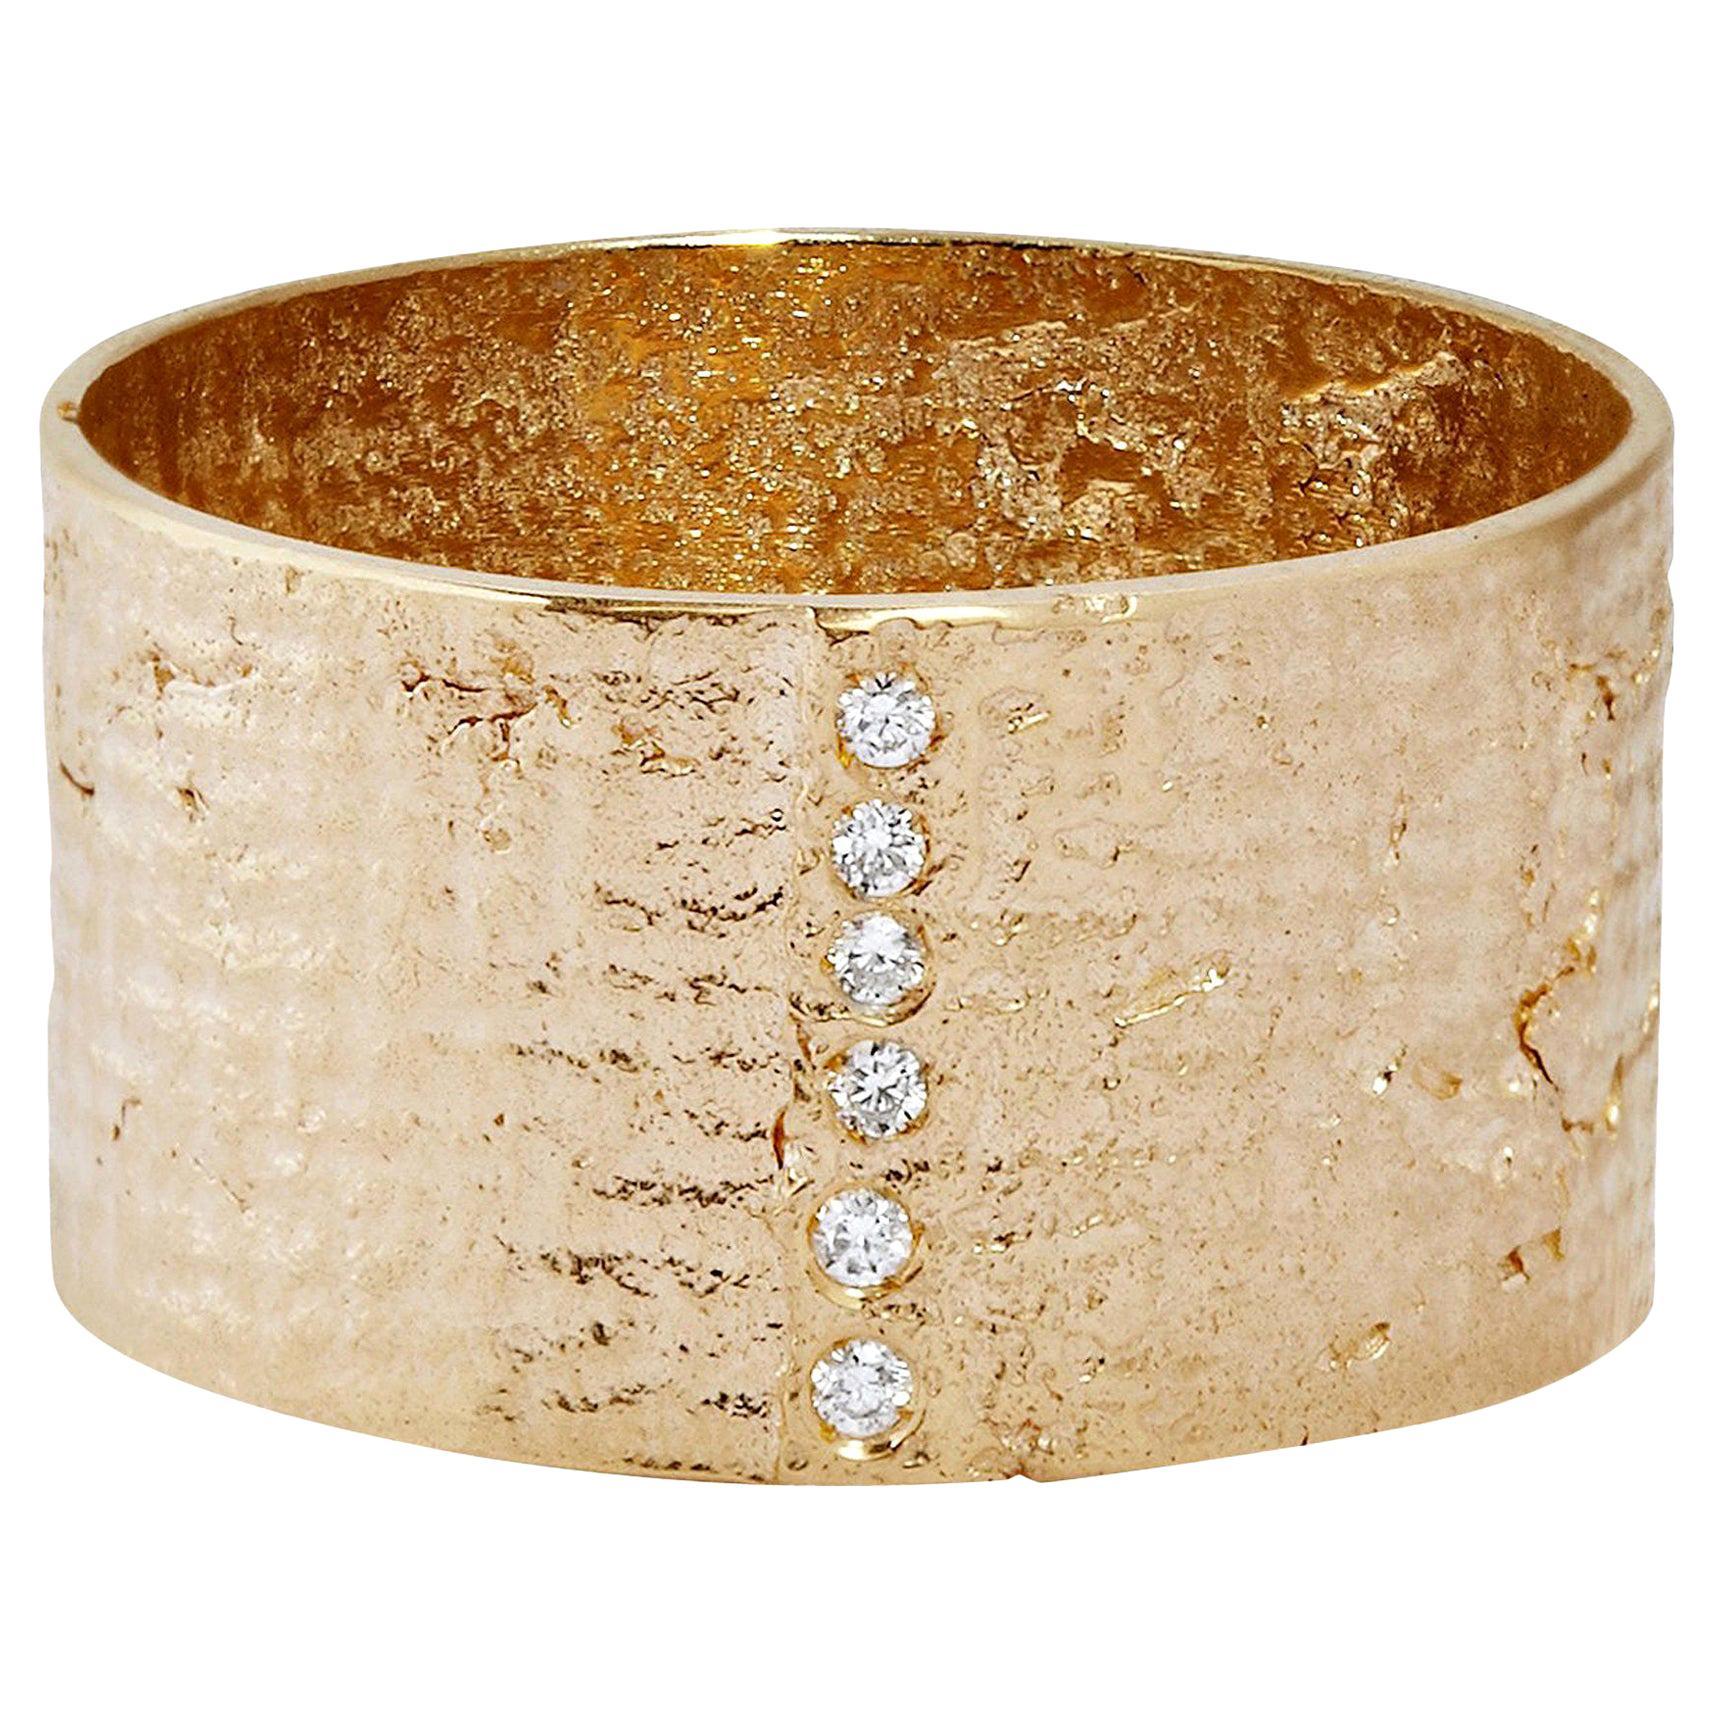 18 Karat Gold Paper Cigar Ring with Diamonds by Allison Bryan